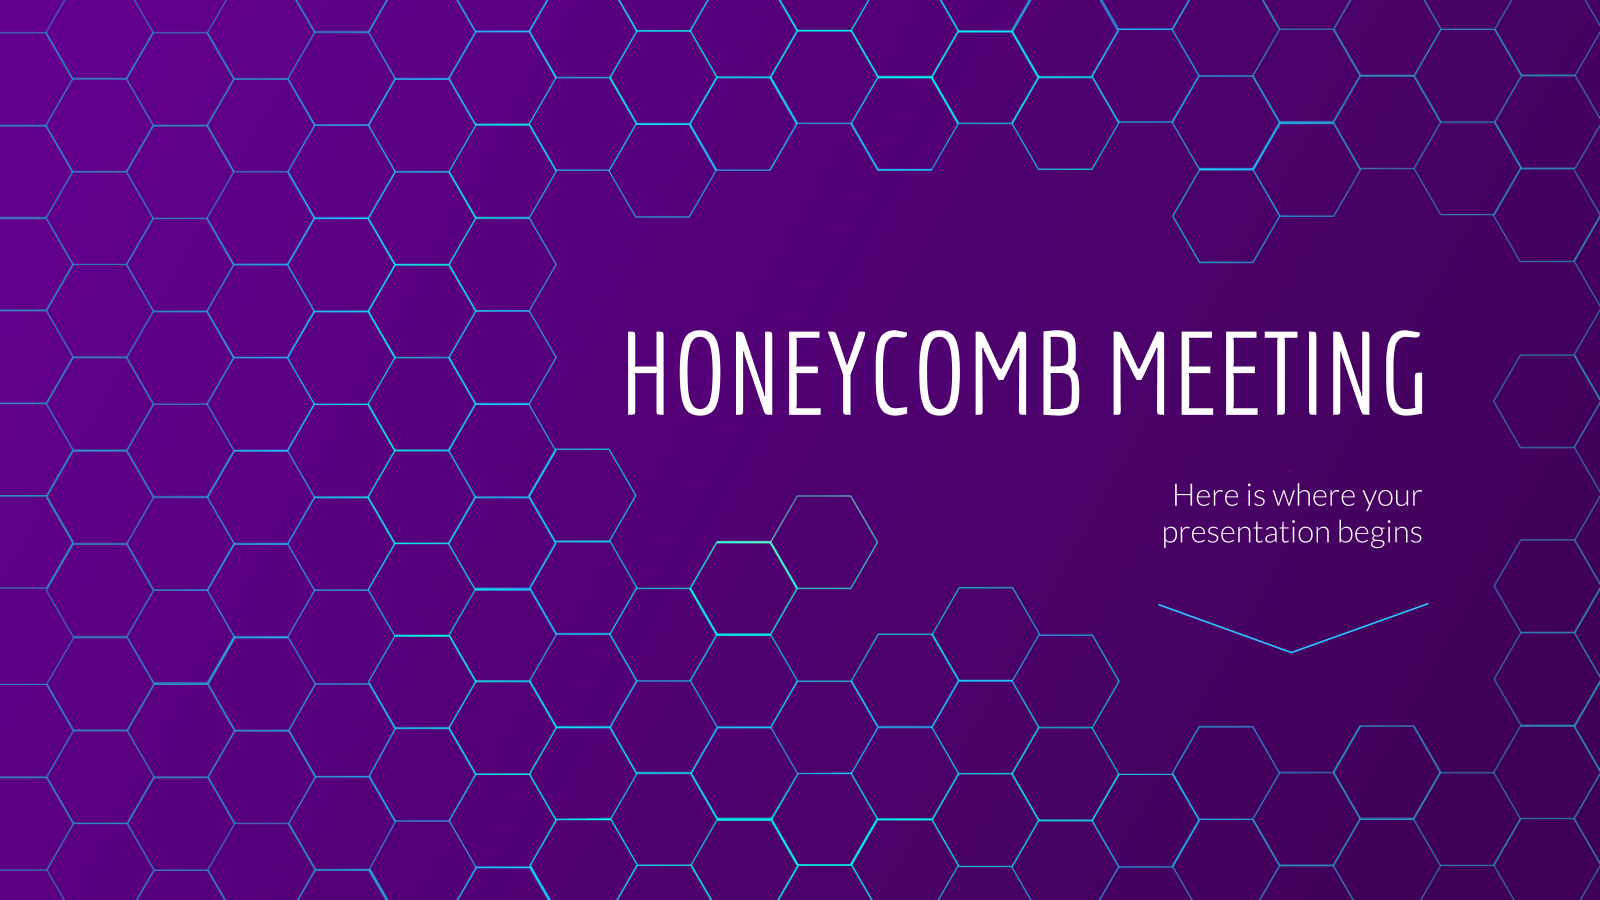 Honeycomb Meeting presentation template